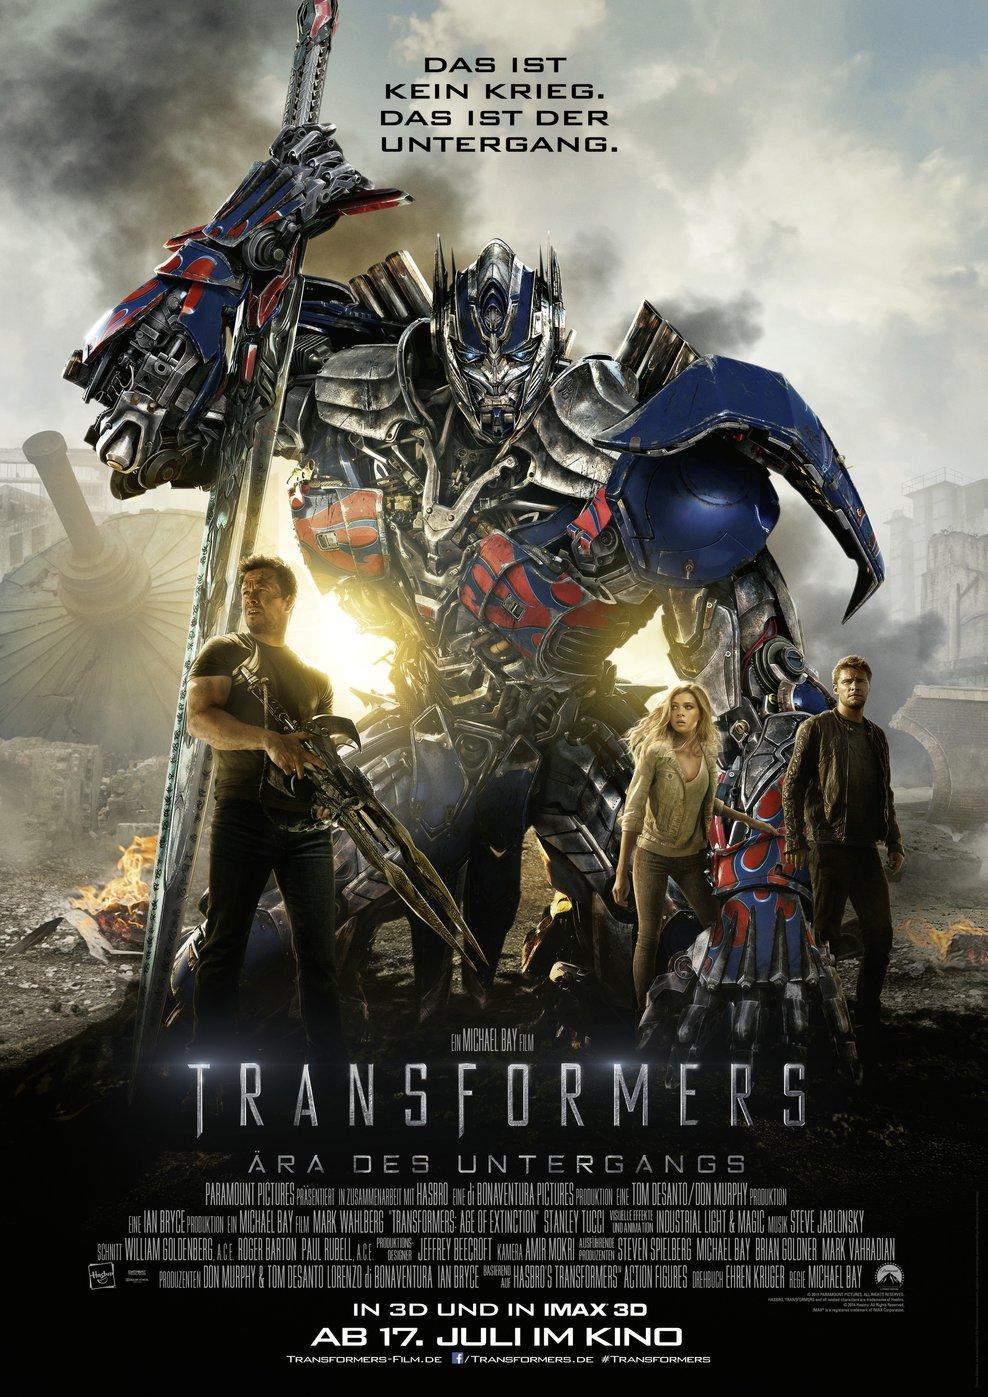 Transformers: Ära des Untergangs (Poster)